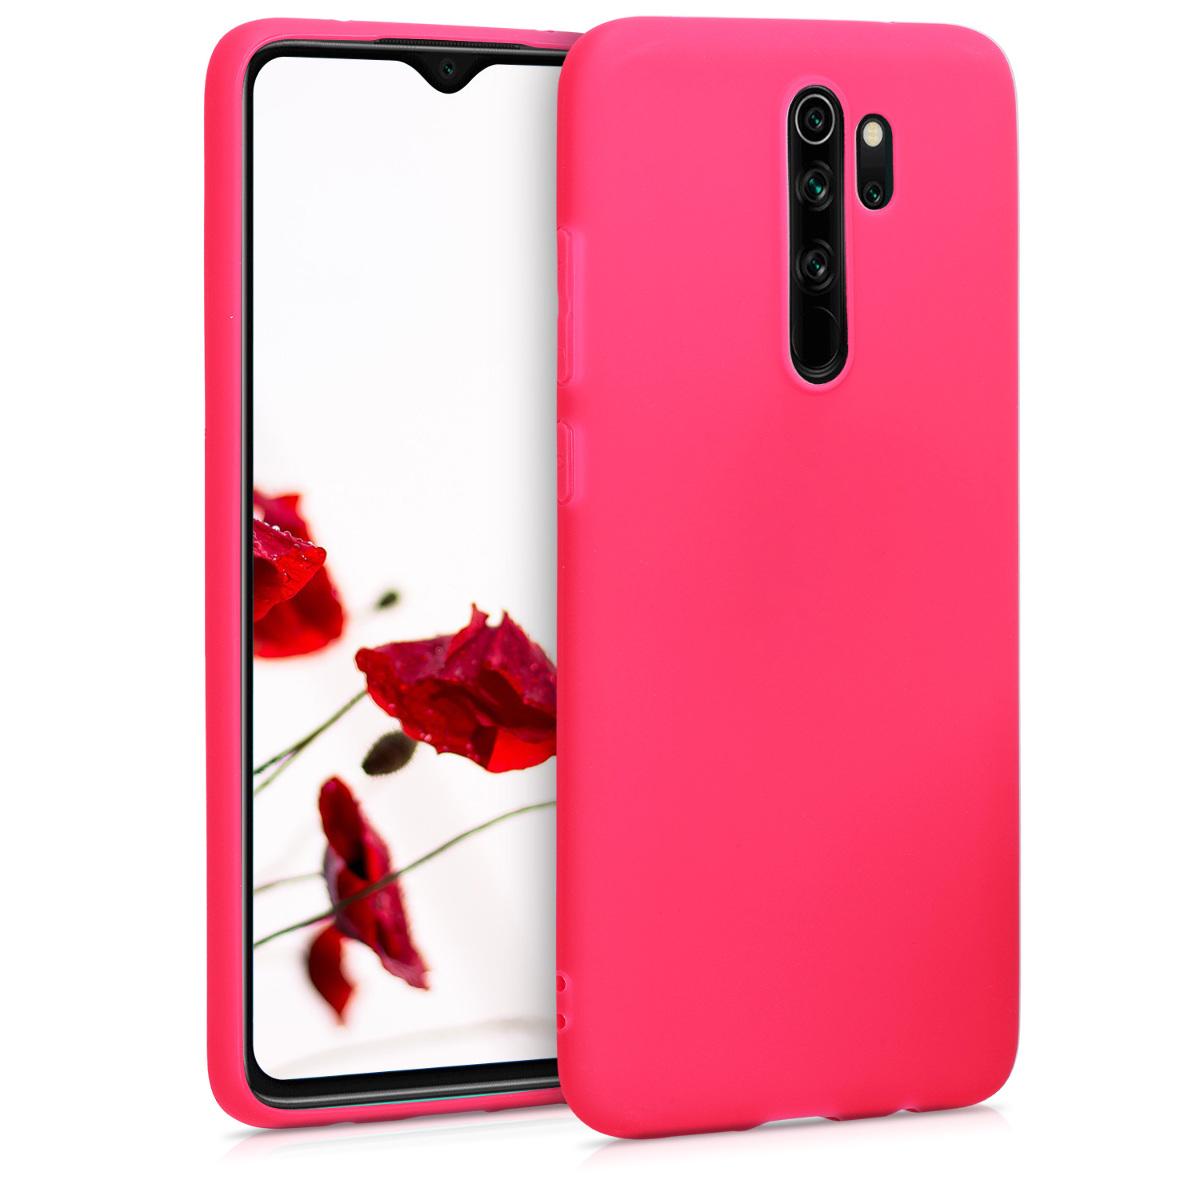 KW Θήκη Σιλικόνης Xiaomi Redmi Note 8 Pro - Neon Pink (50251.77)